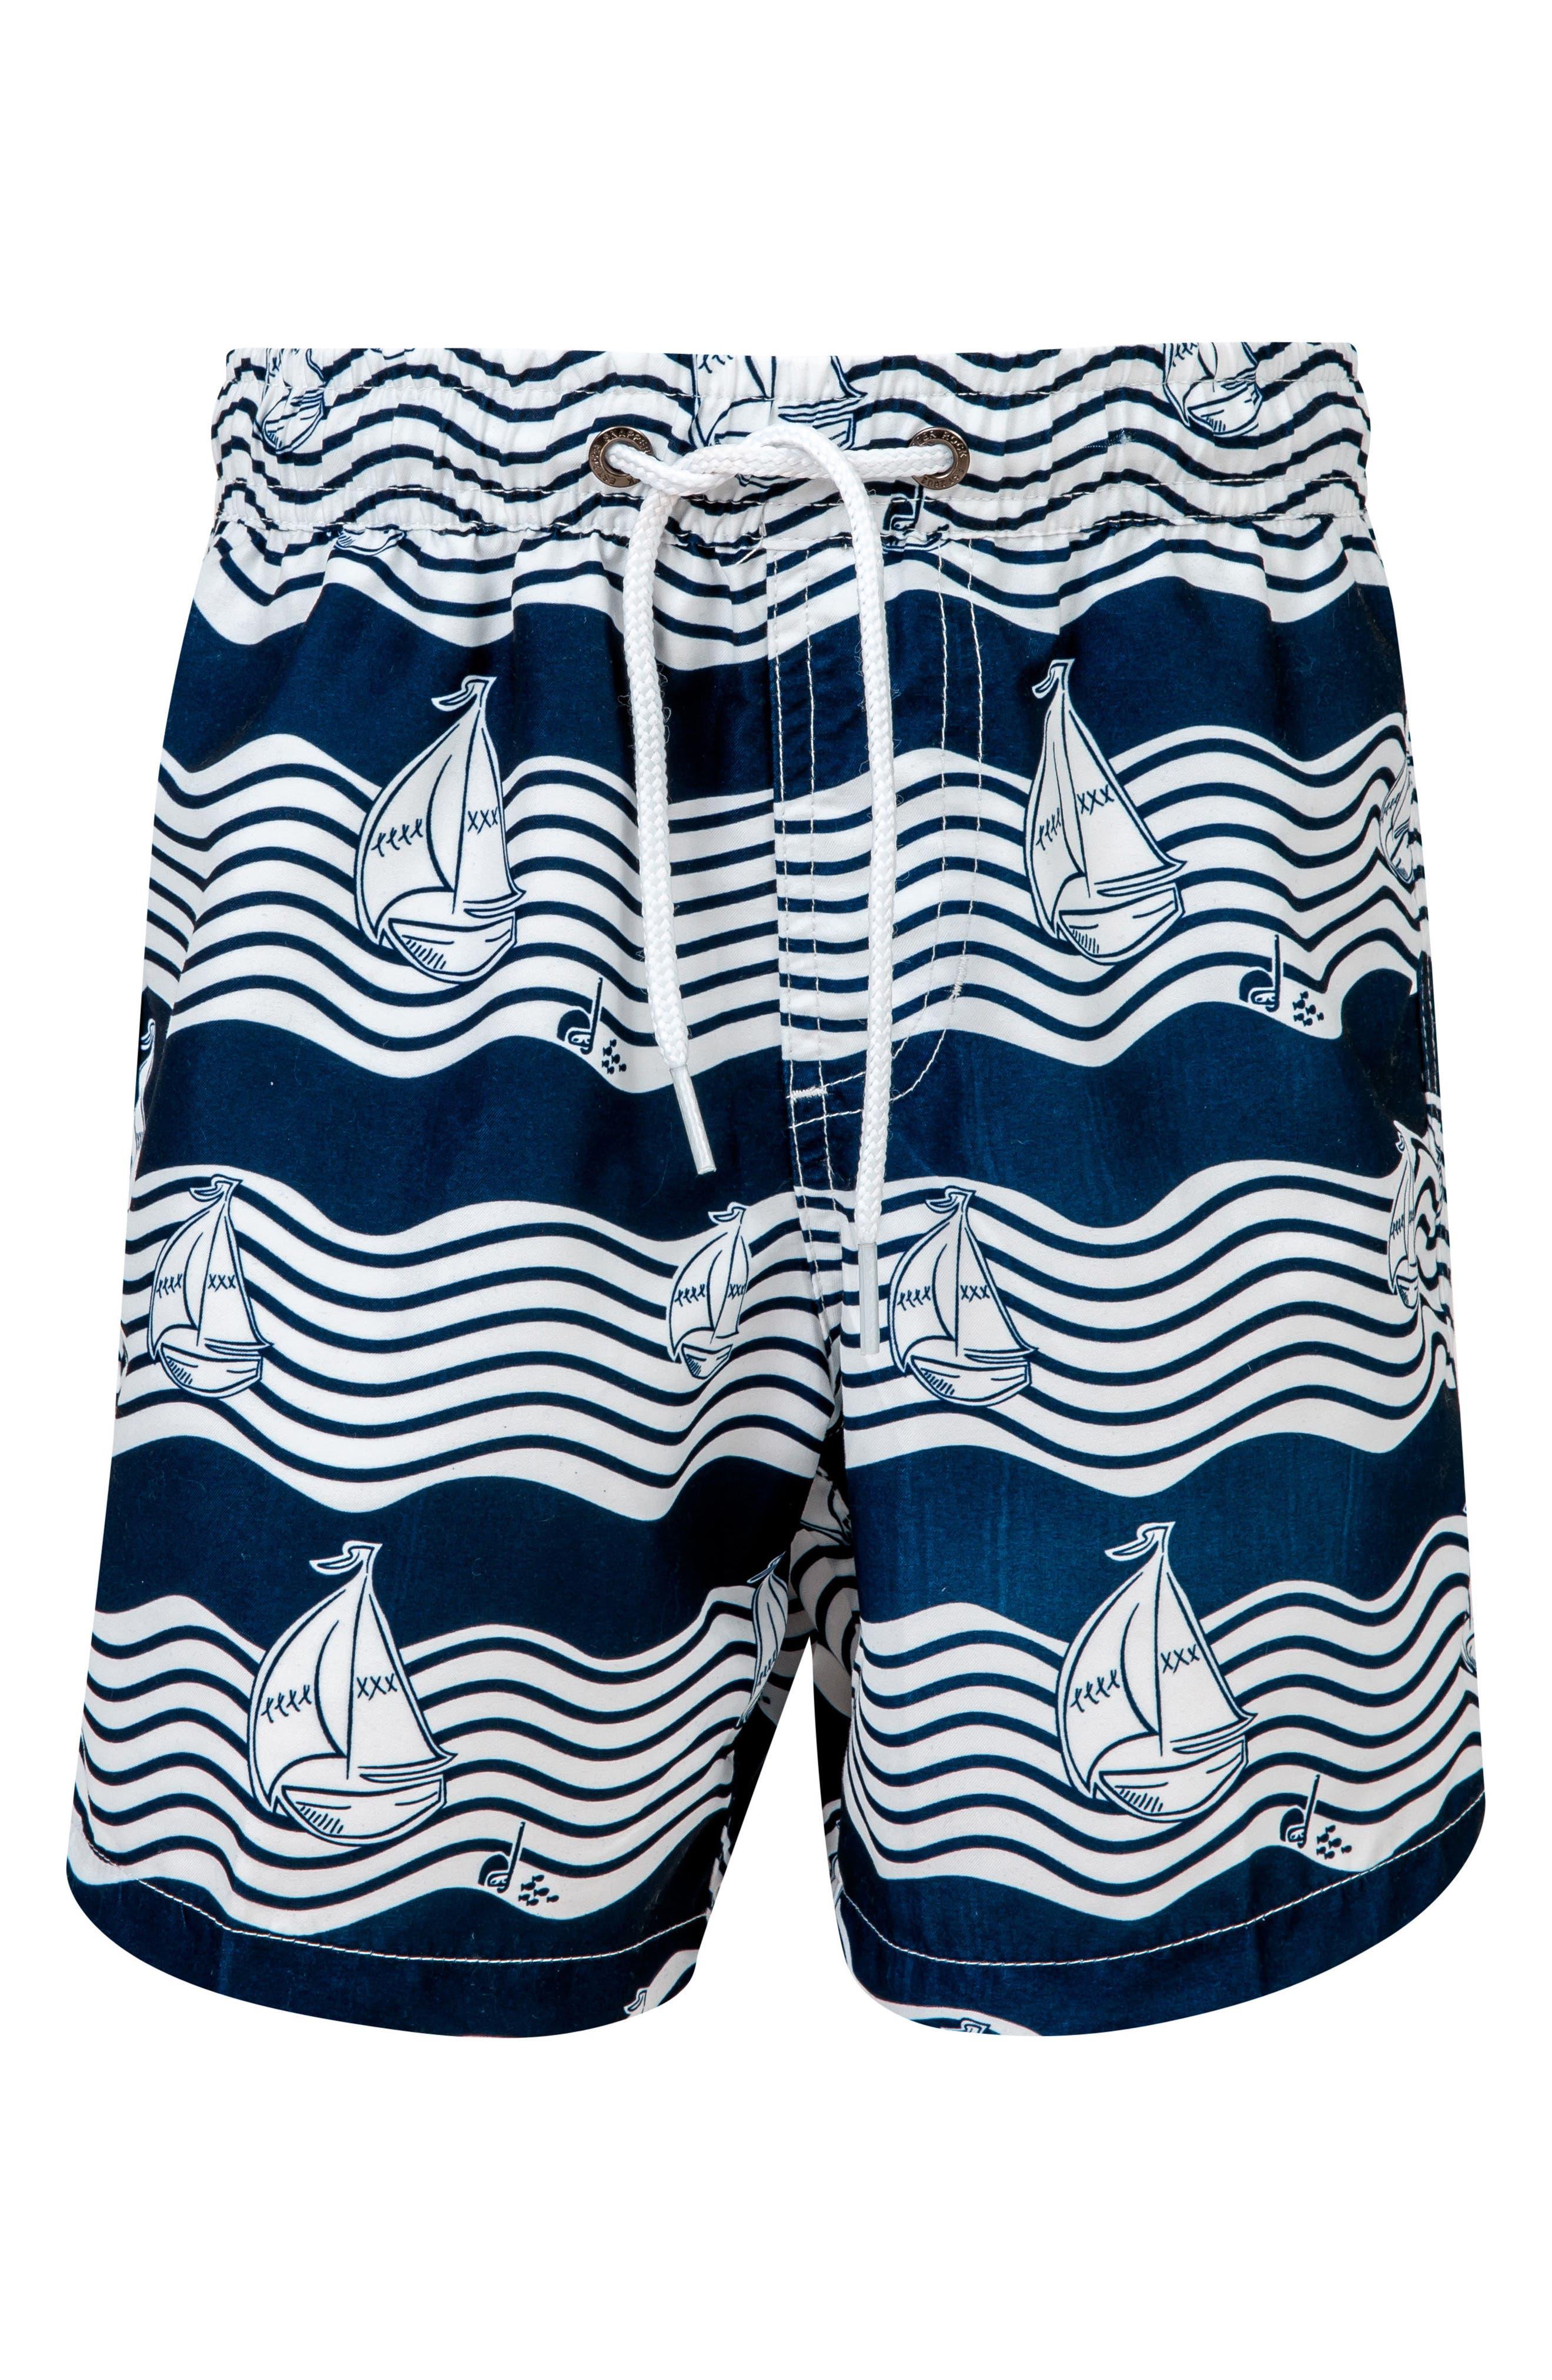 Ocean Explorer Board Shorts,                         Main,                         color, White/ Navy